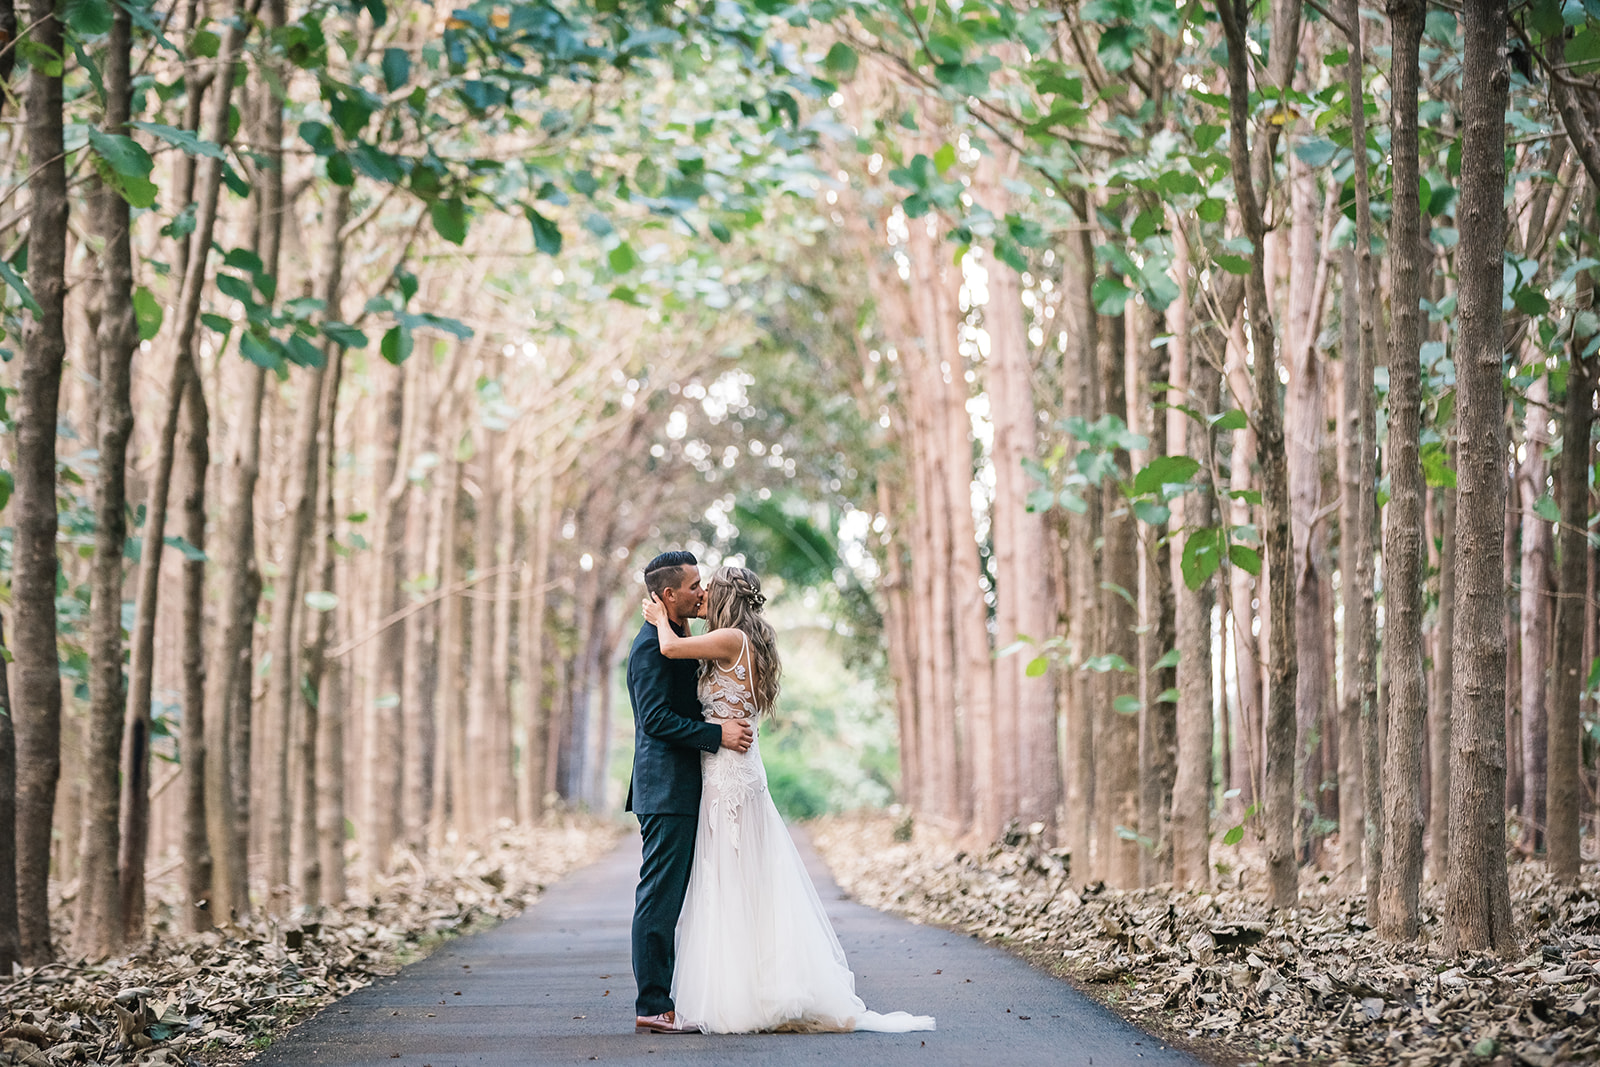 Jennifer & Johnny, Na'Aina Kai wedding